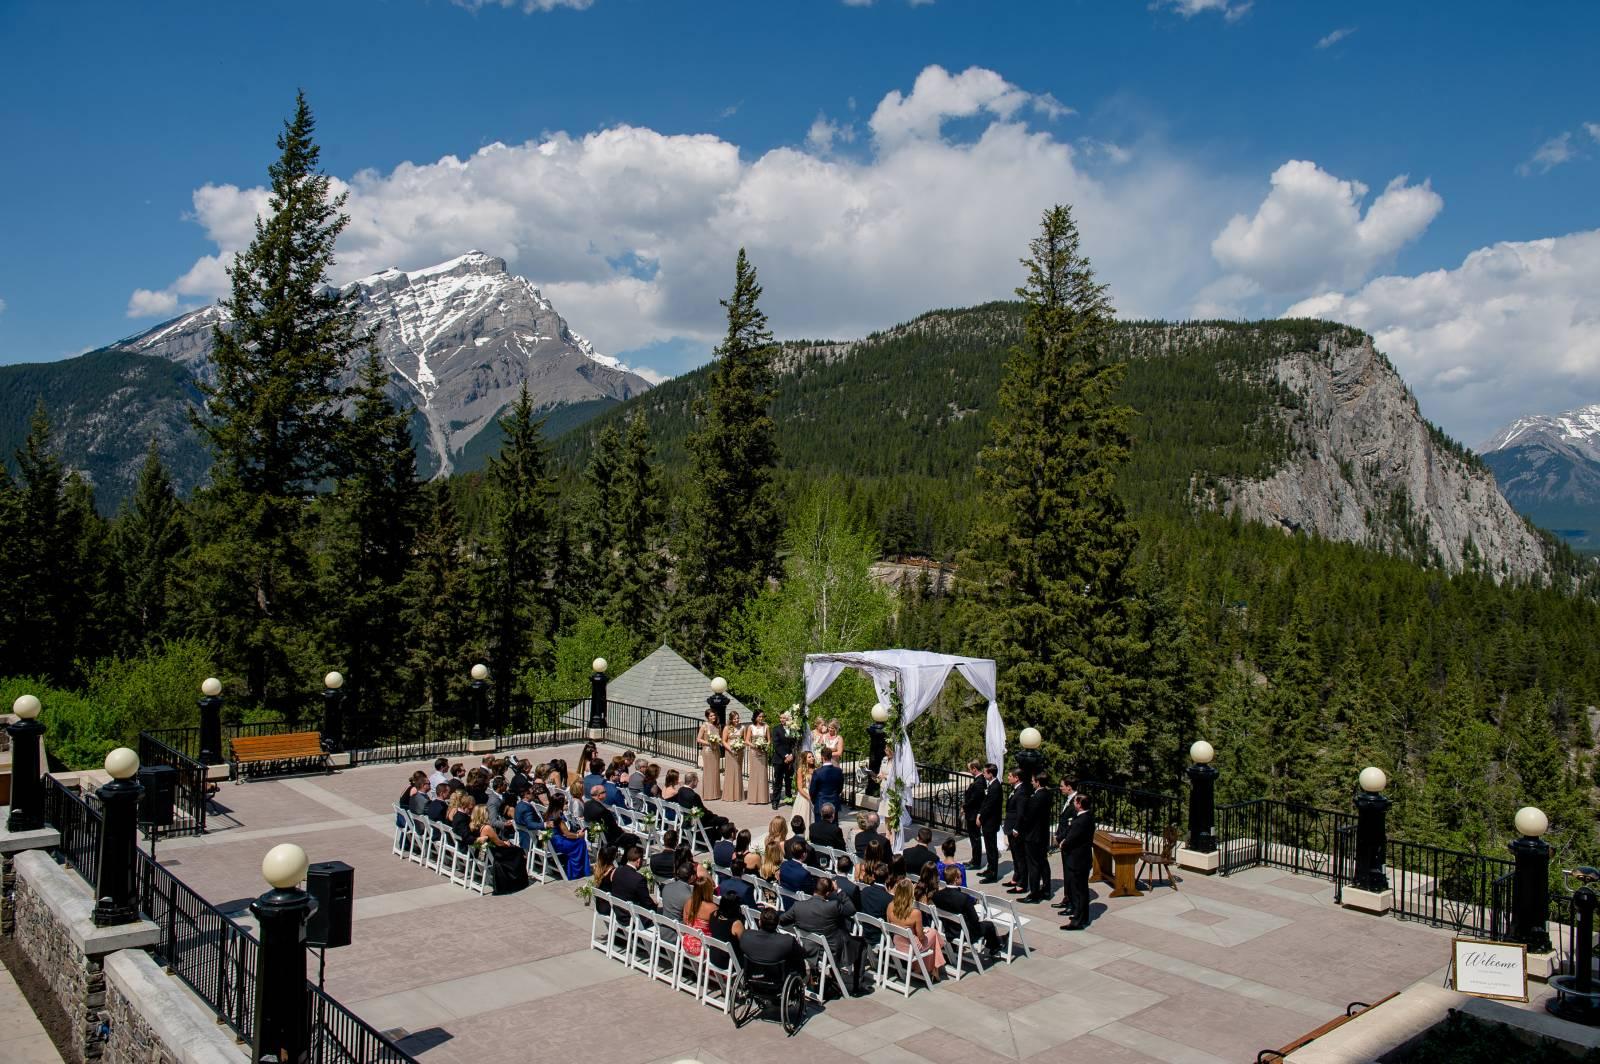 Fairmont Banff Springs Wedding Venue Weddings At The Castle In Rockies Item 5